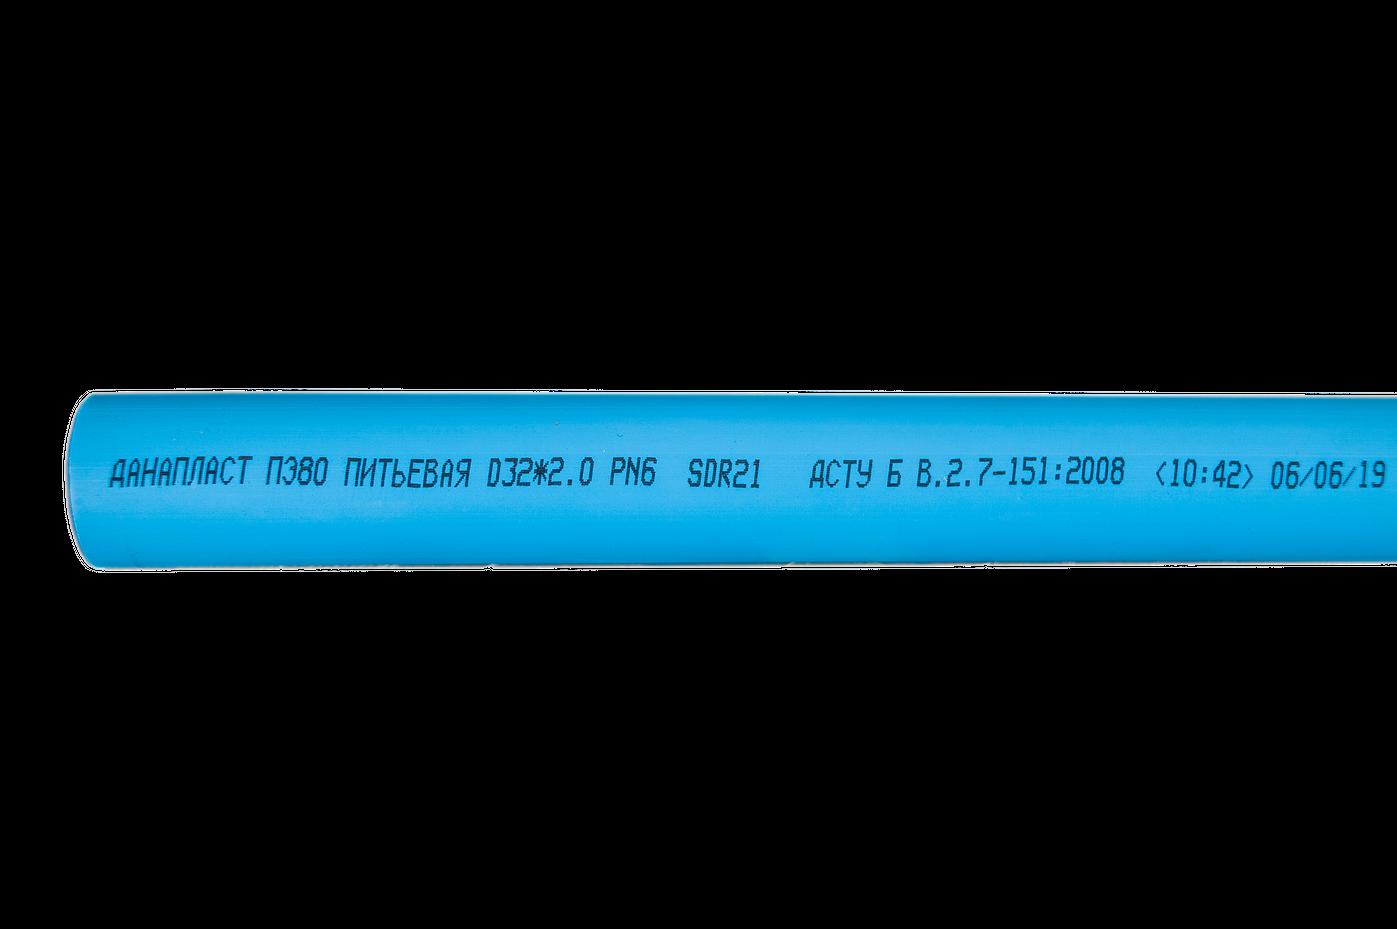 Danaplast Food-Grade Polyethylene Pipe, Blue, 20-110 mm Diameter image